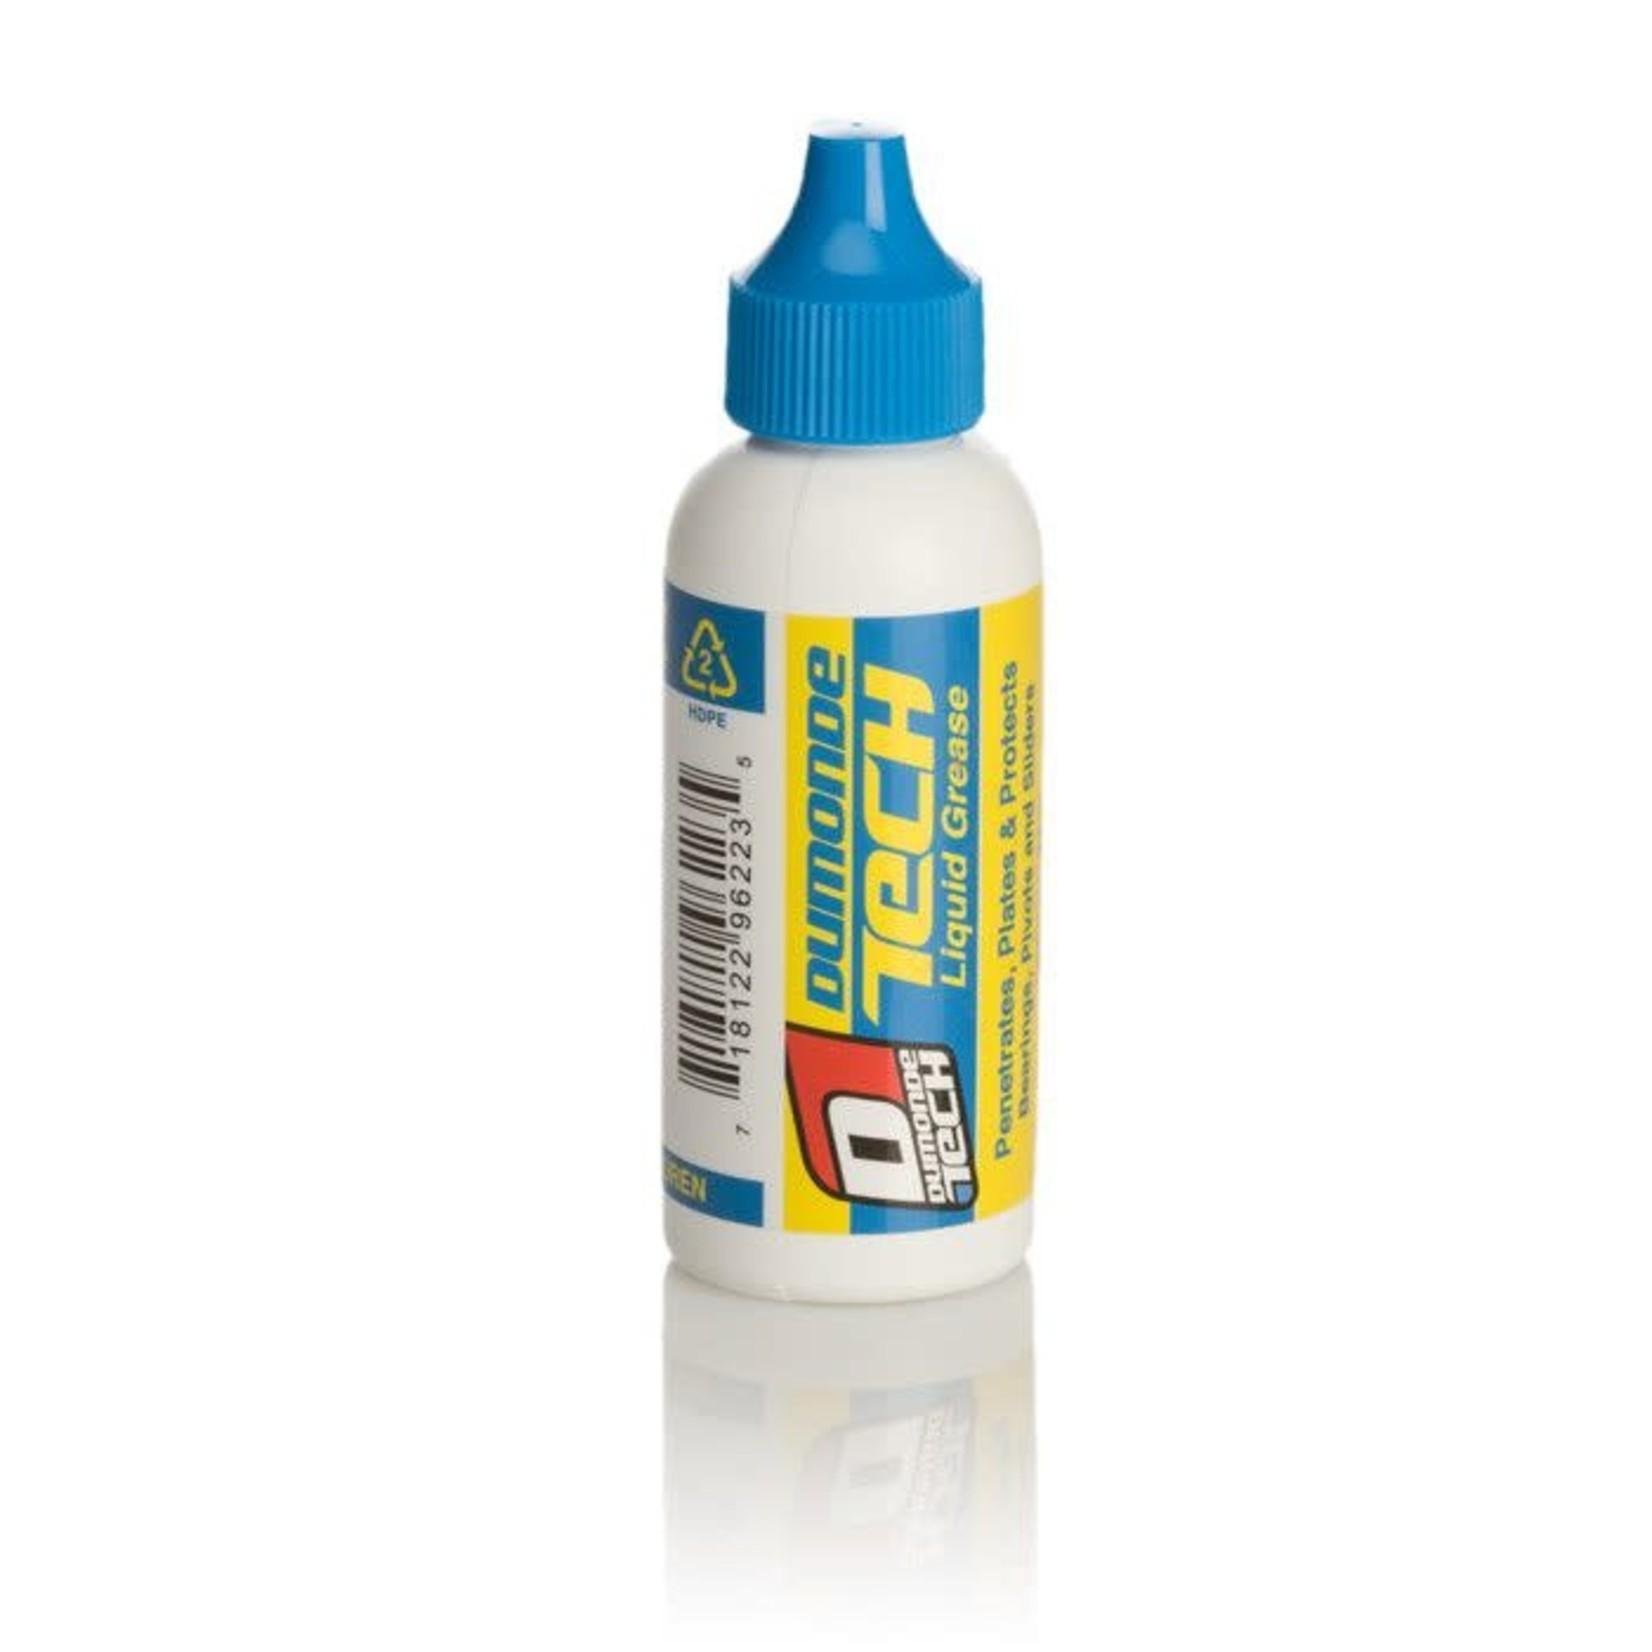 Dumonde Tech Dumonde Tech - Liquid Grease 4oz